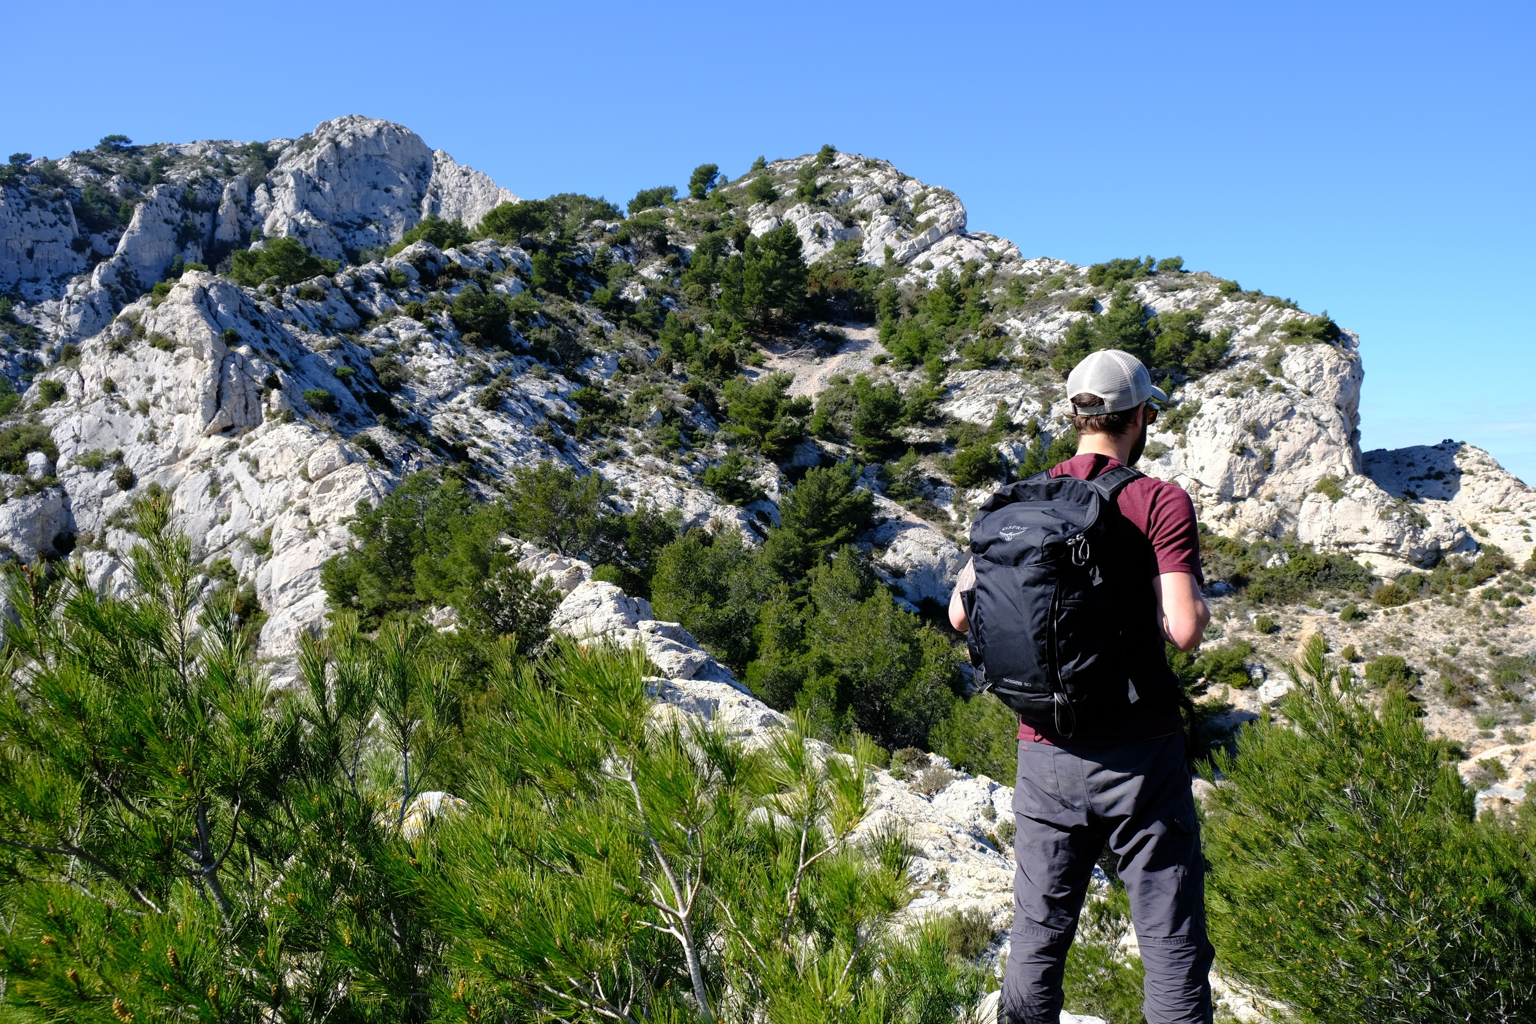 osprey skarab 30 review